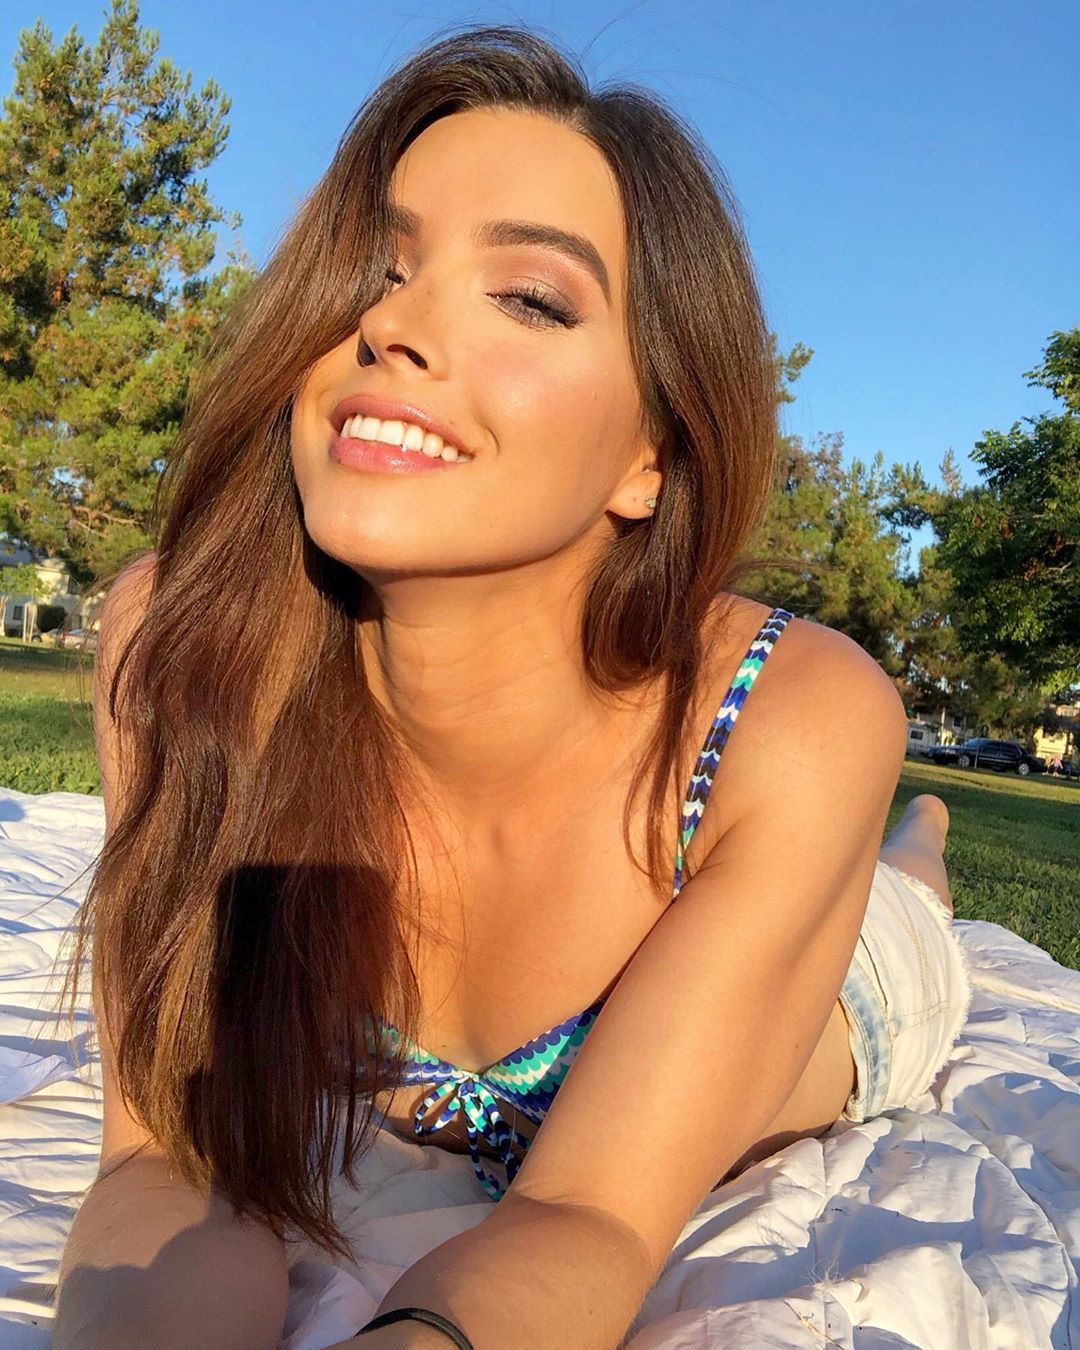 Carolina Gutierrez - Most Beautiful Transgender Woman